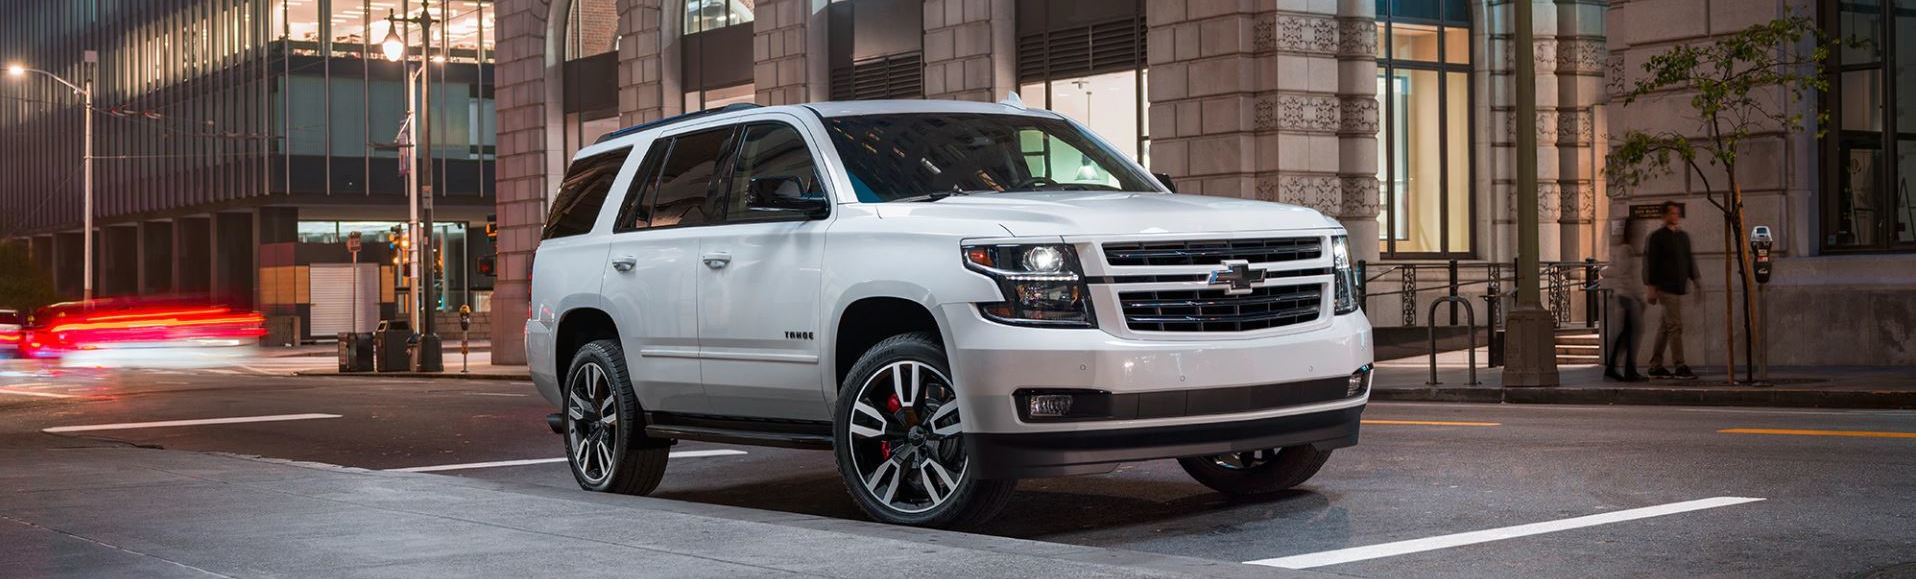 2020 Chevrolet Tahoe for Sale near Naperville, IL